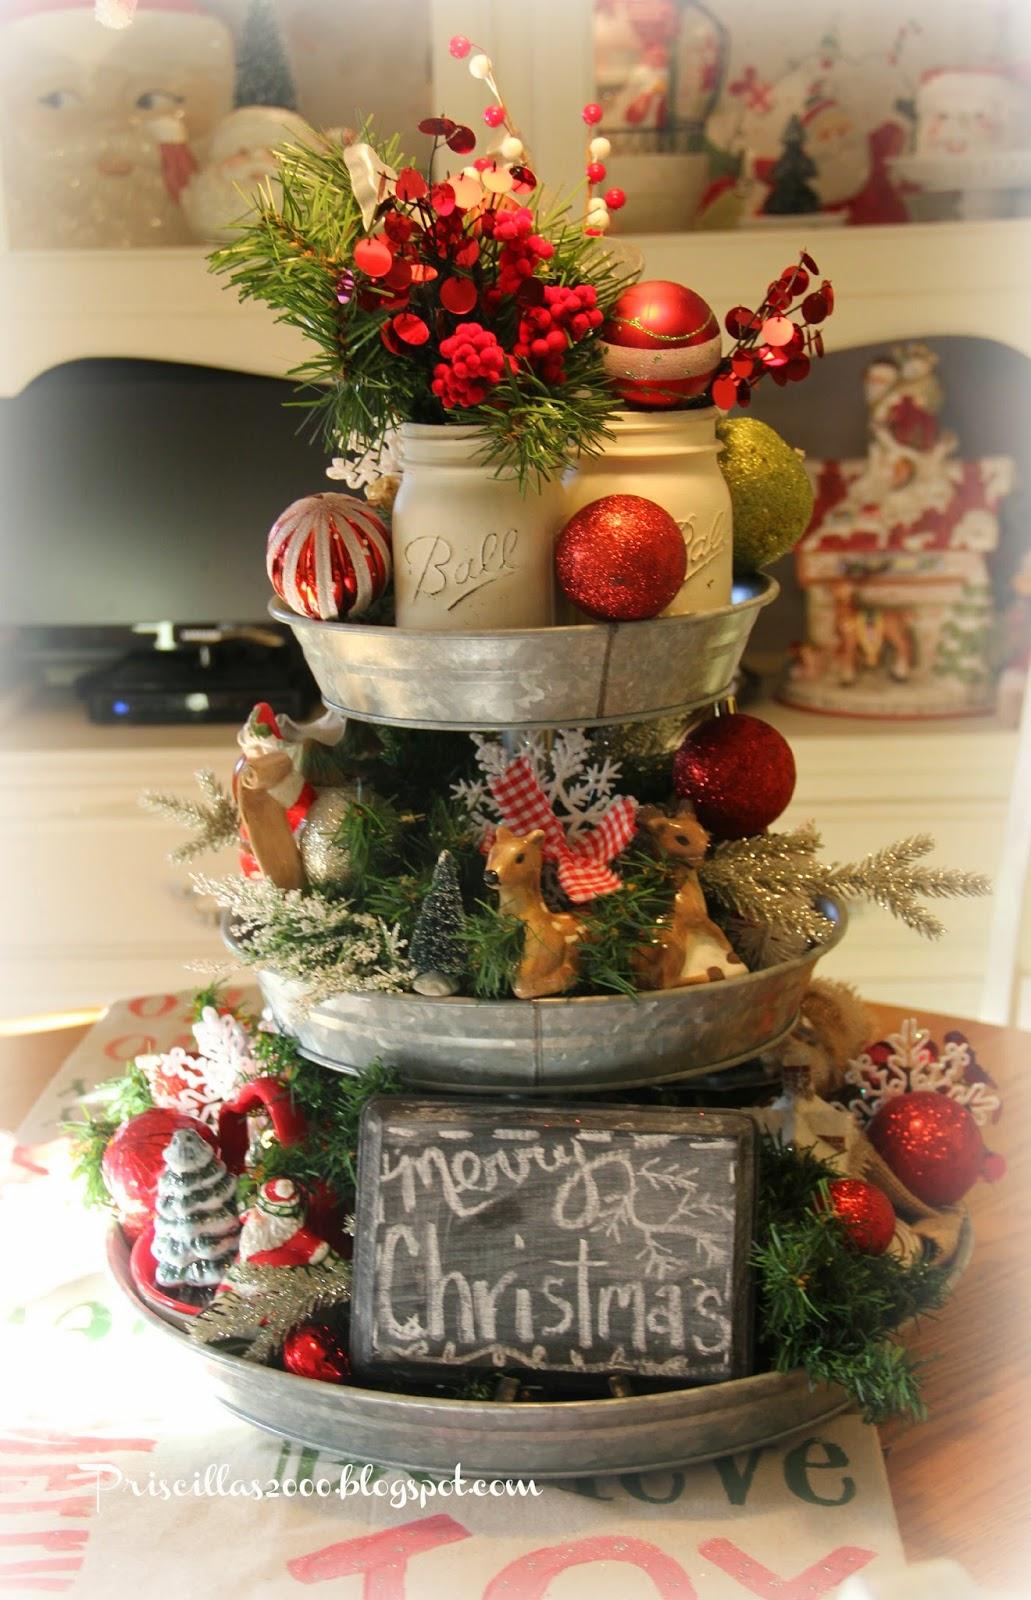 Priscillas: Christmas Galvanized Tray Centerpiece